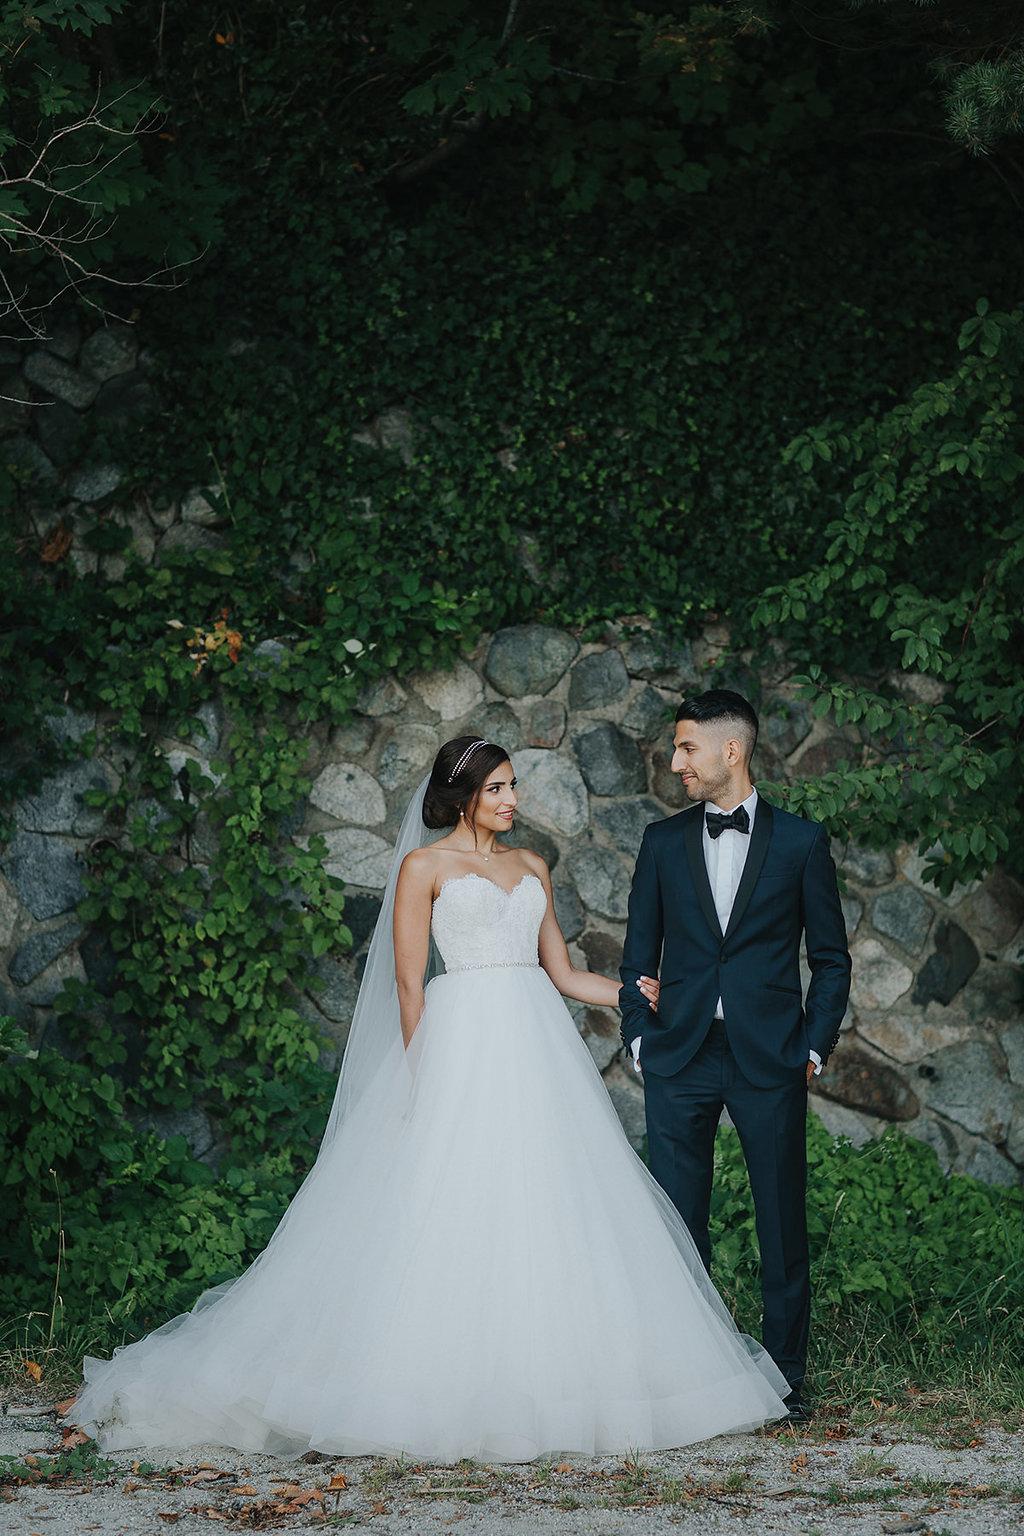 Elegant Canadian Wedding with Greenery - photo by Melia Lucida https://ruffledblog.com/elegant-canadian-wedding-with-greenery